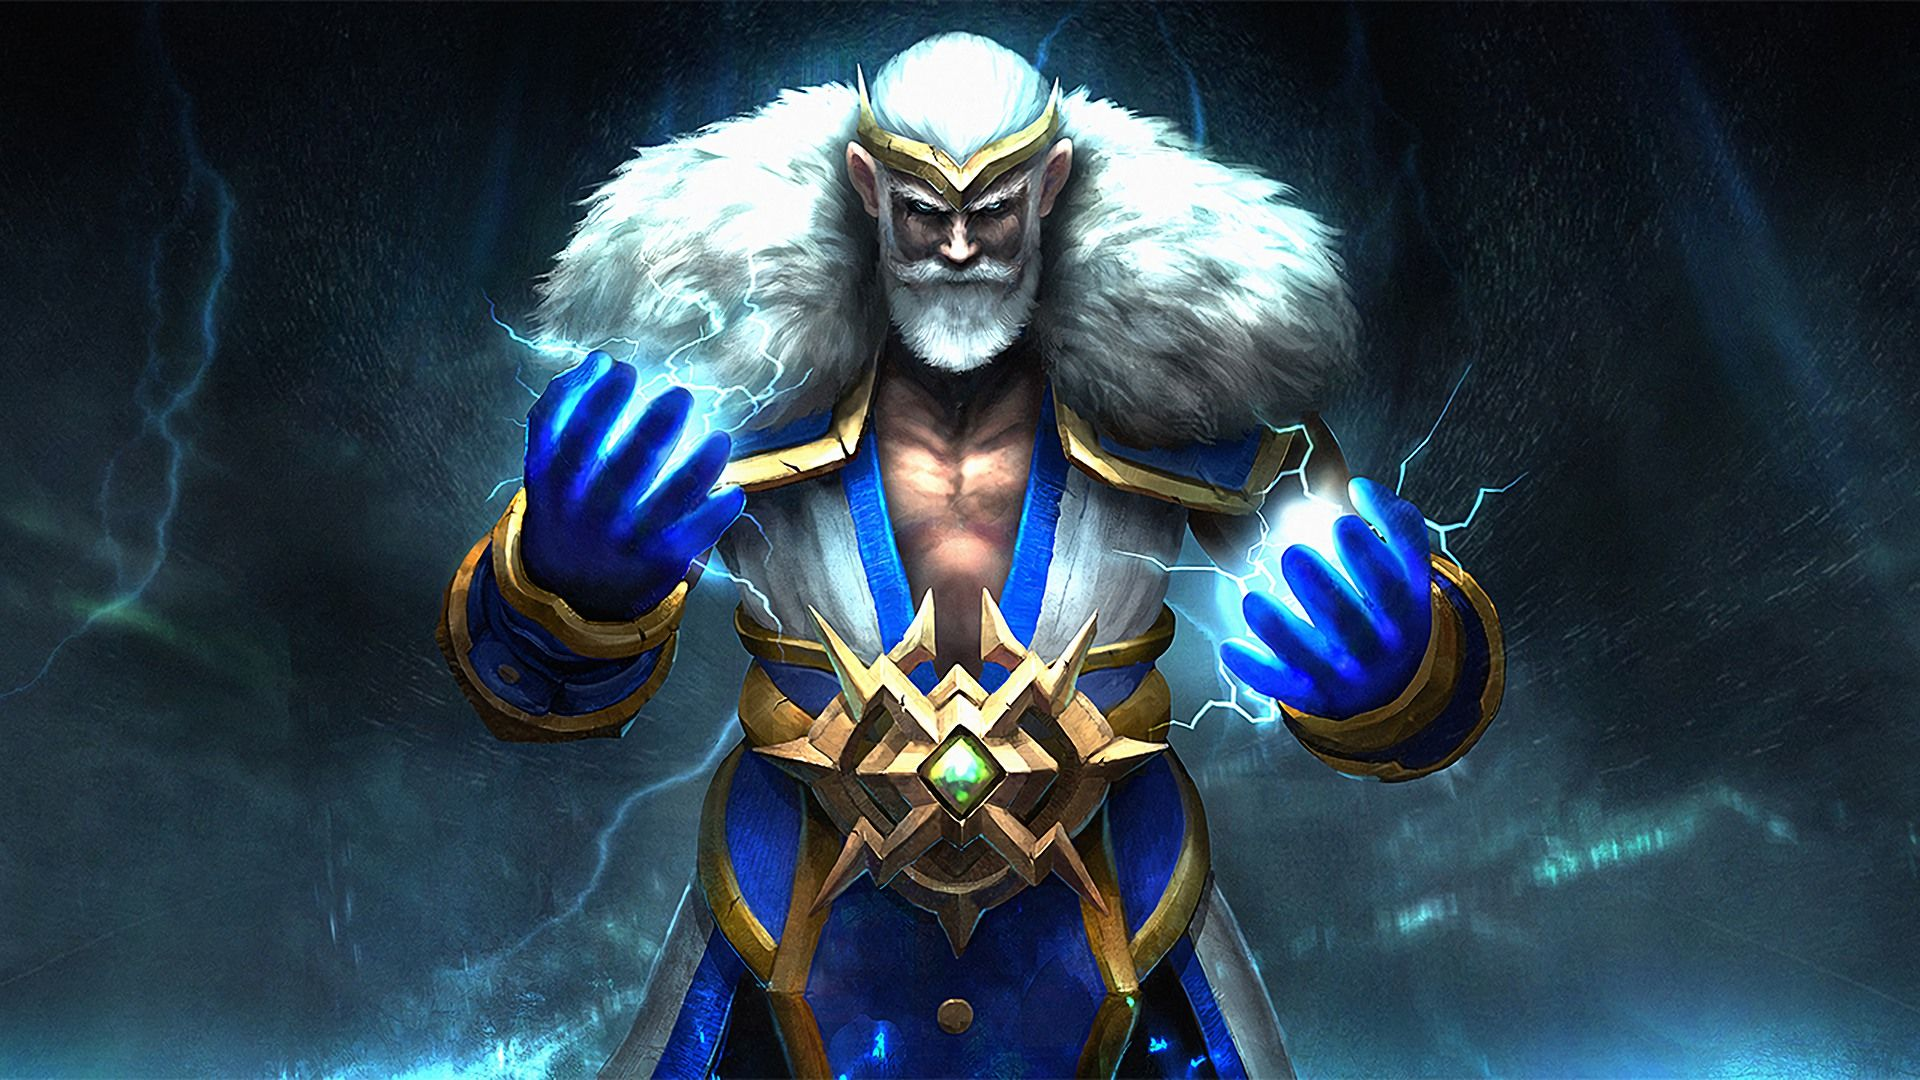 Zeus Dota 2 Loading Screen Emperor Of The Gods Set Images Hd